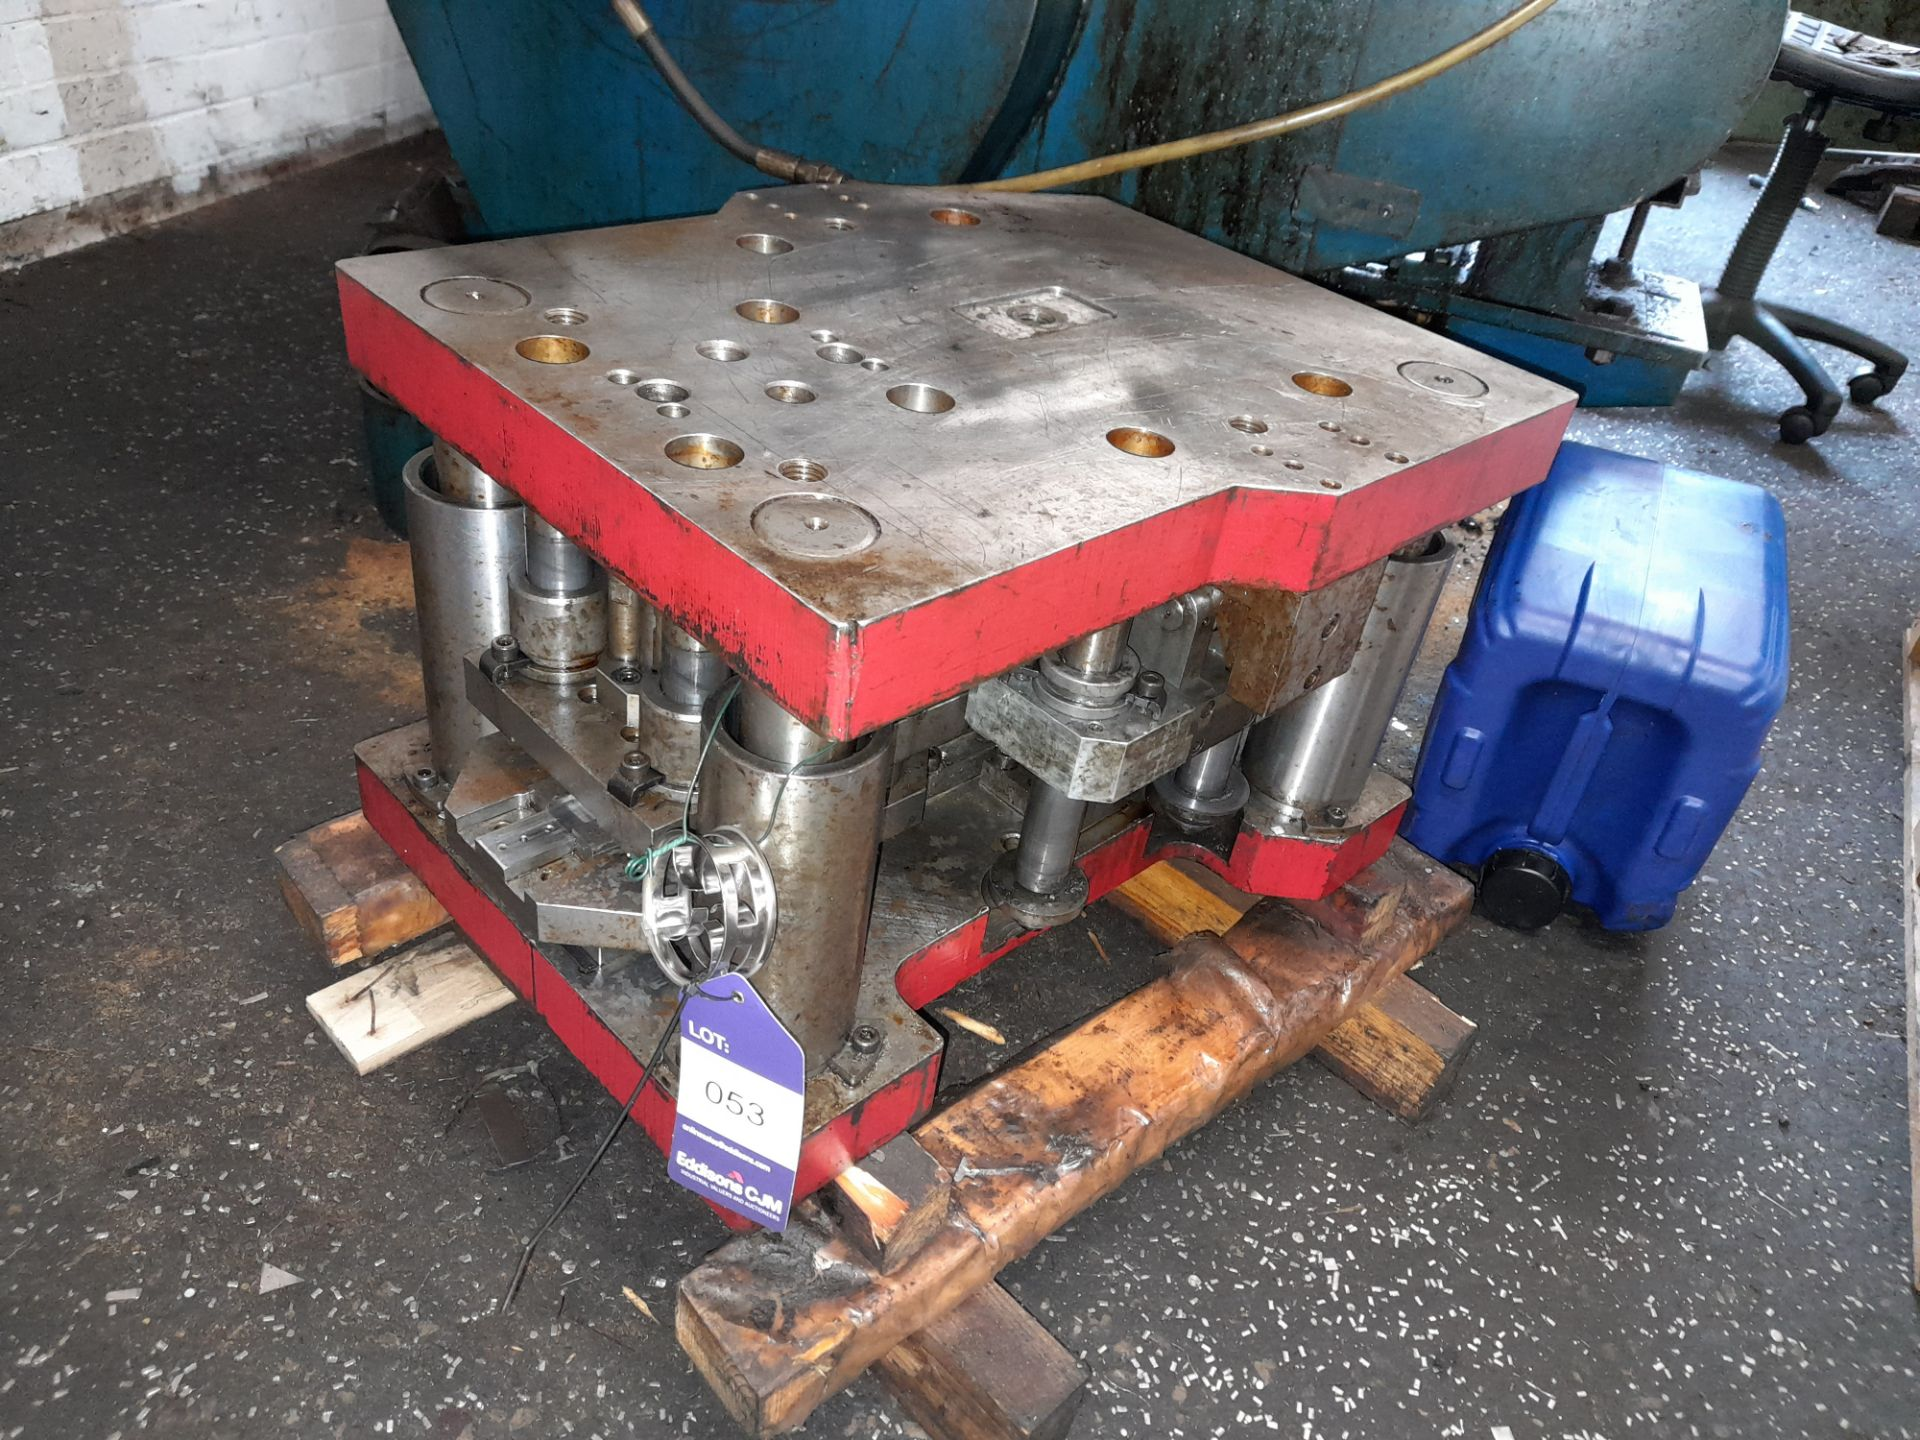 C Ring 3 Press Tool